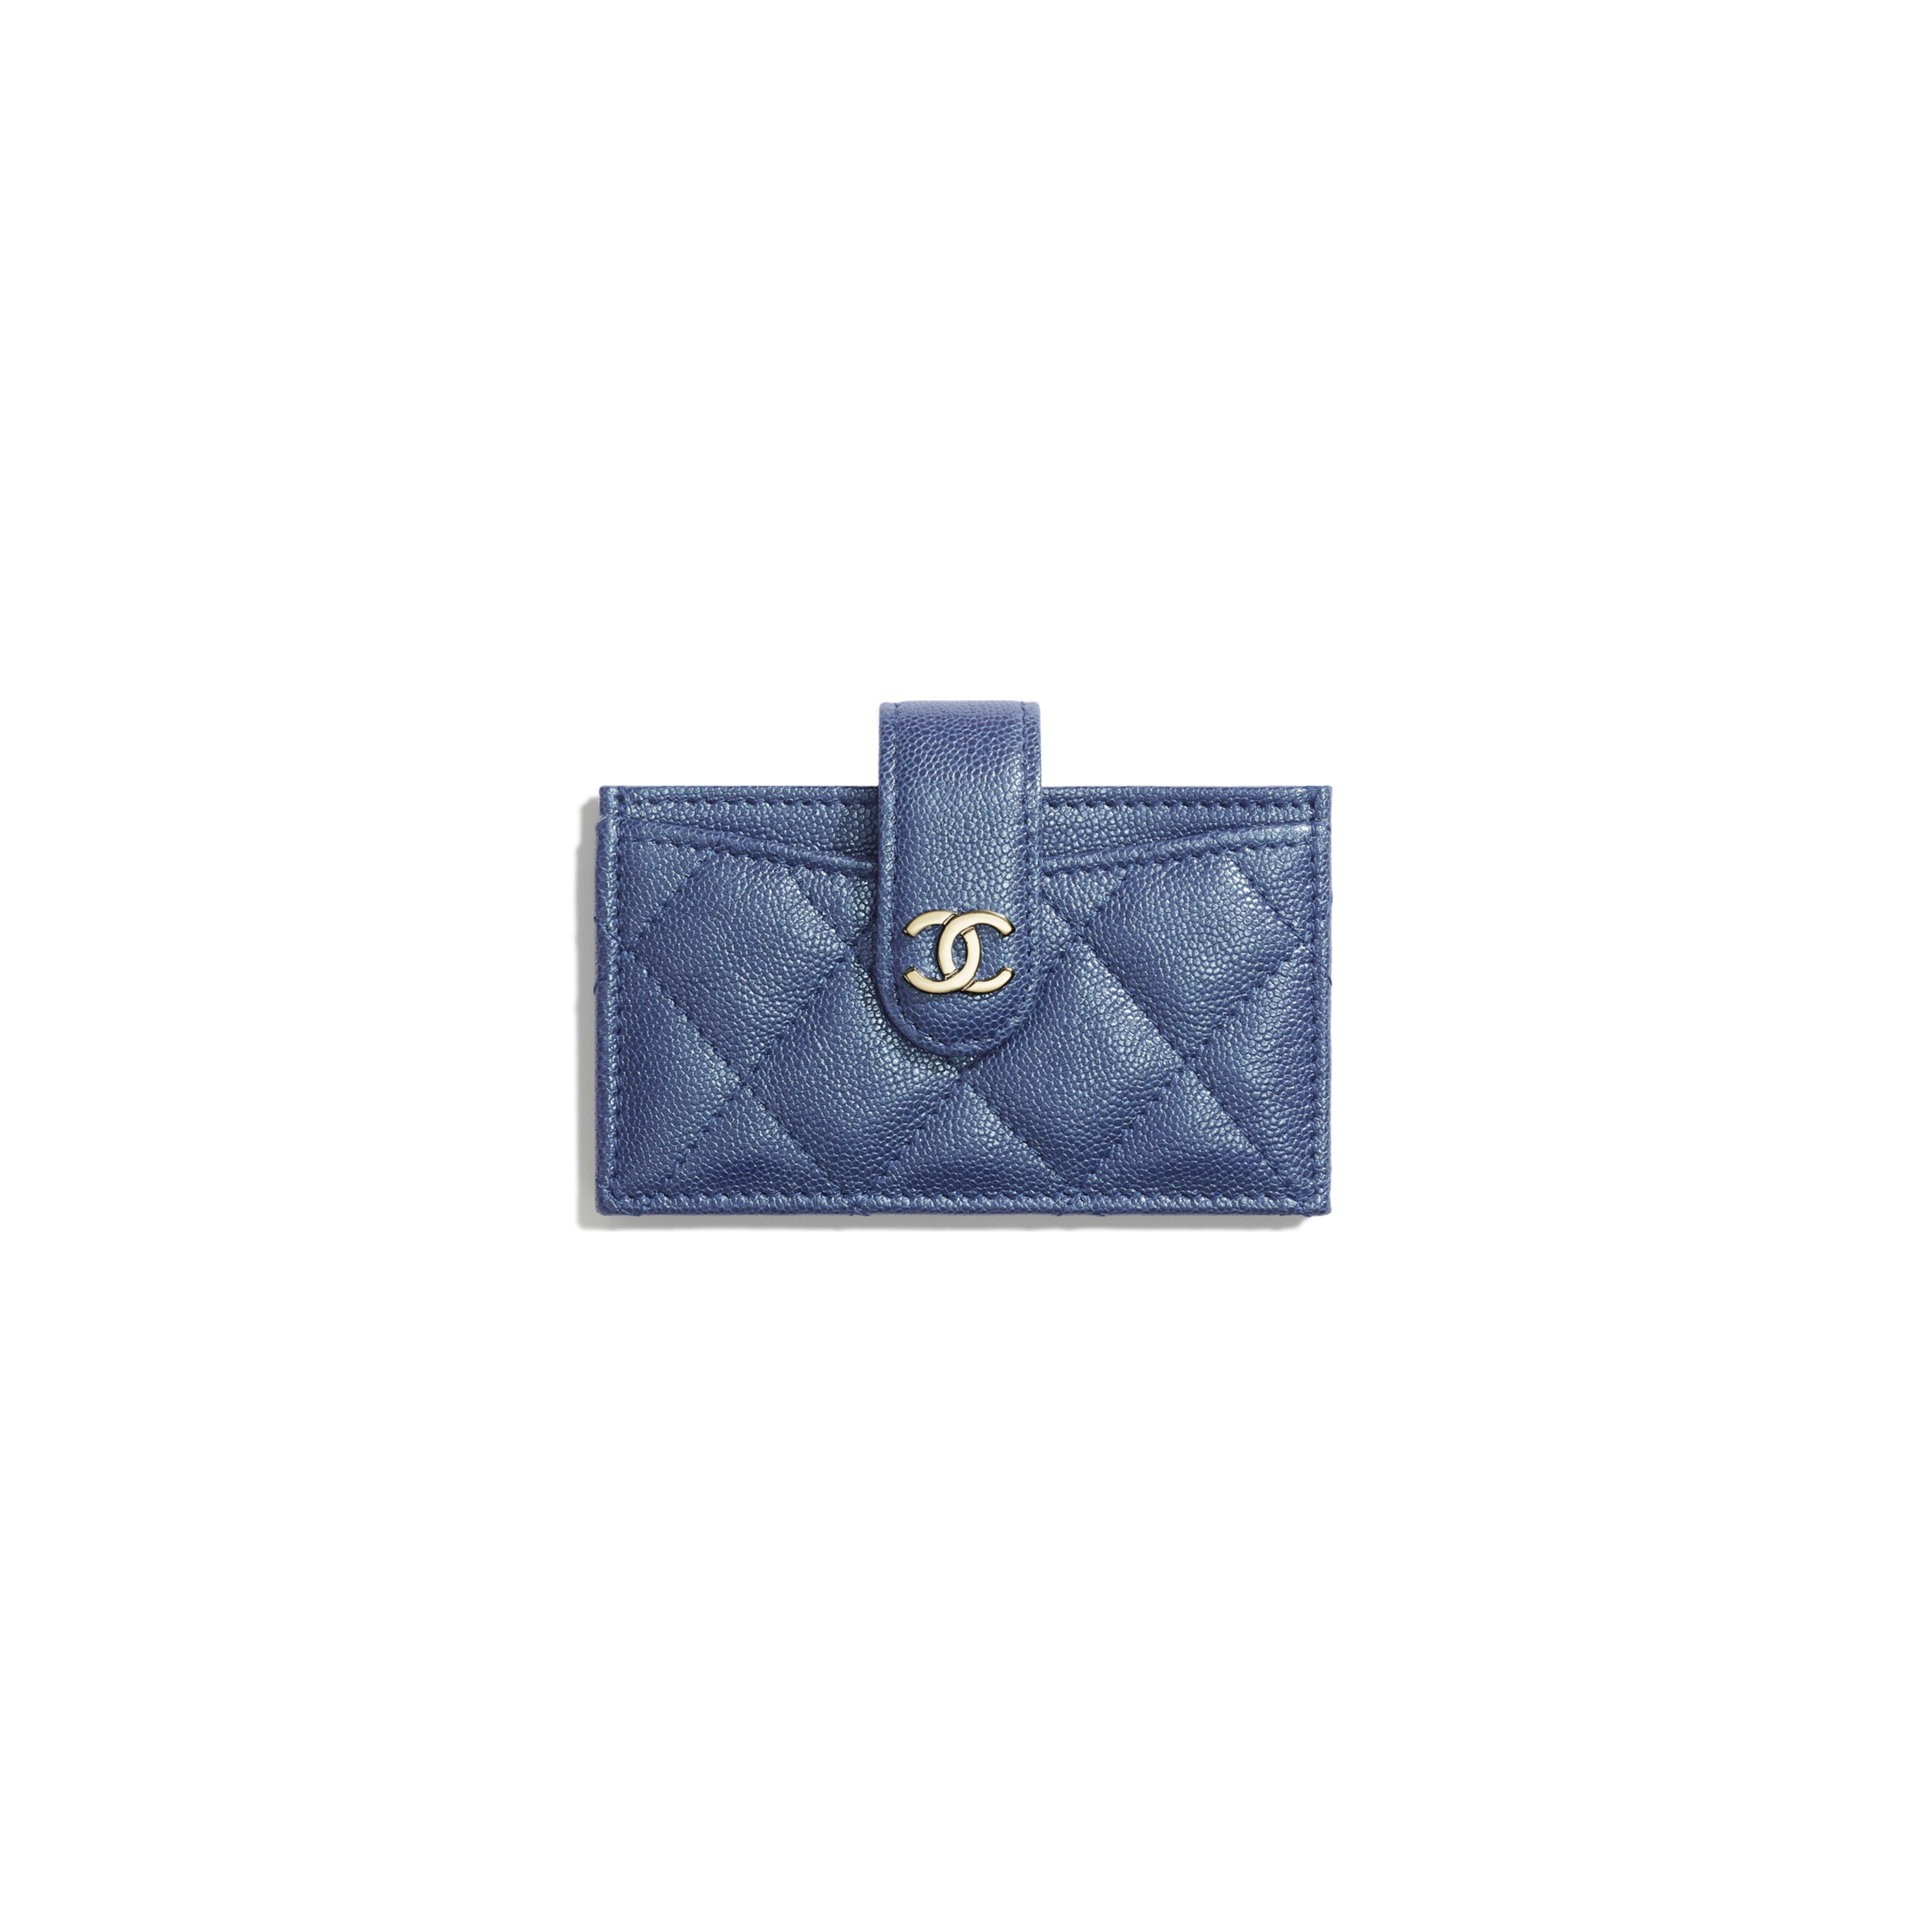 Card Holder - Dark Blue - Iridescent Grained Calfskin & Gold-Tone Metal - Default view - see full sized version